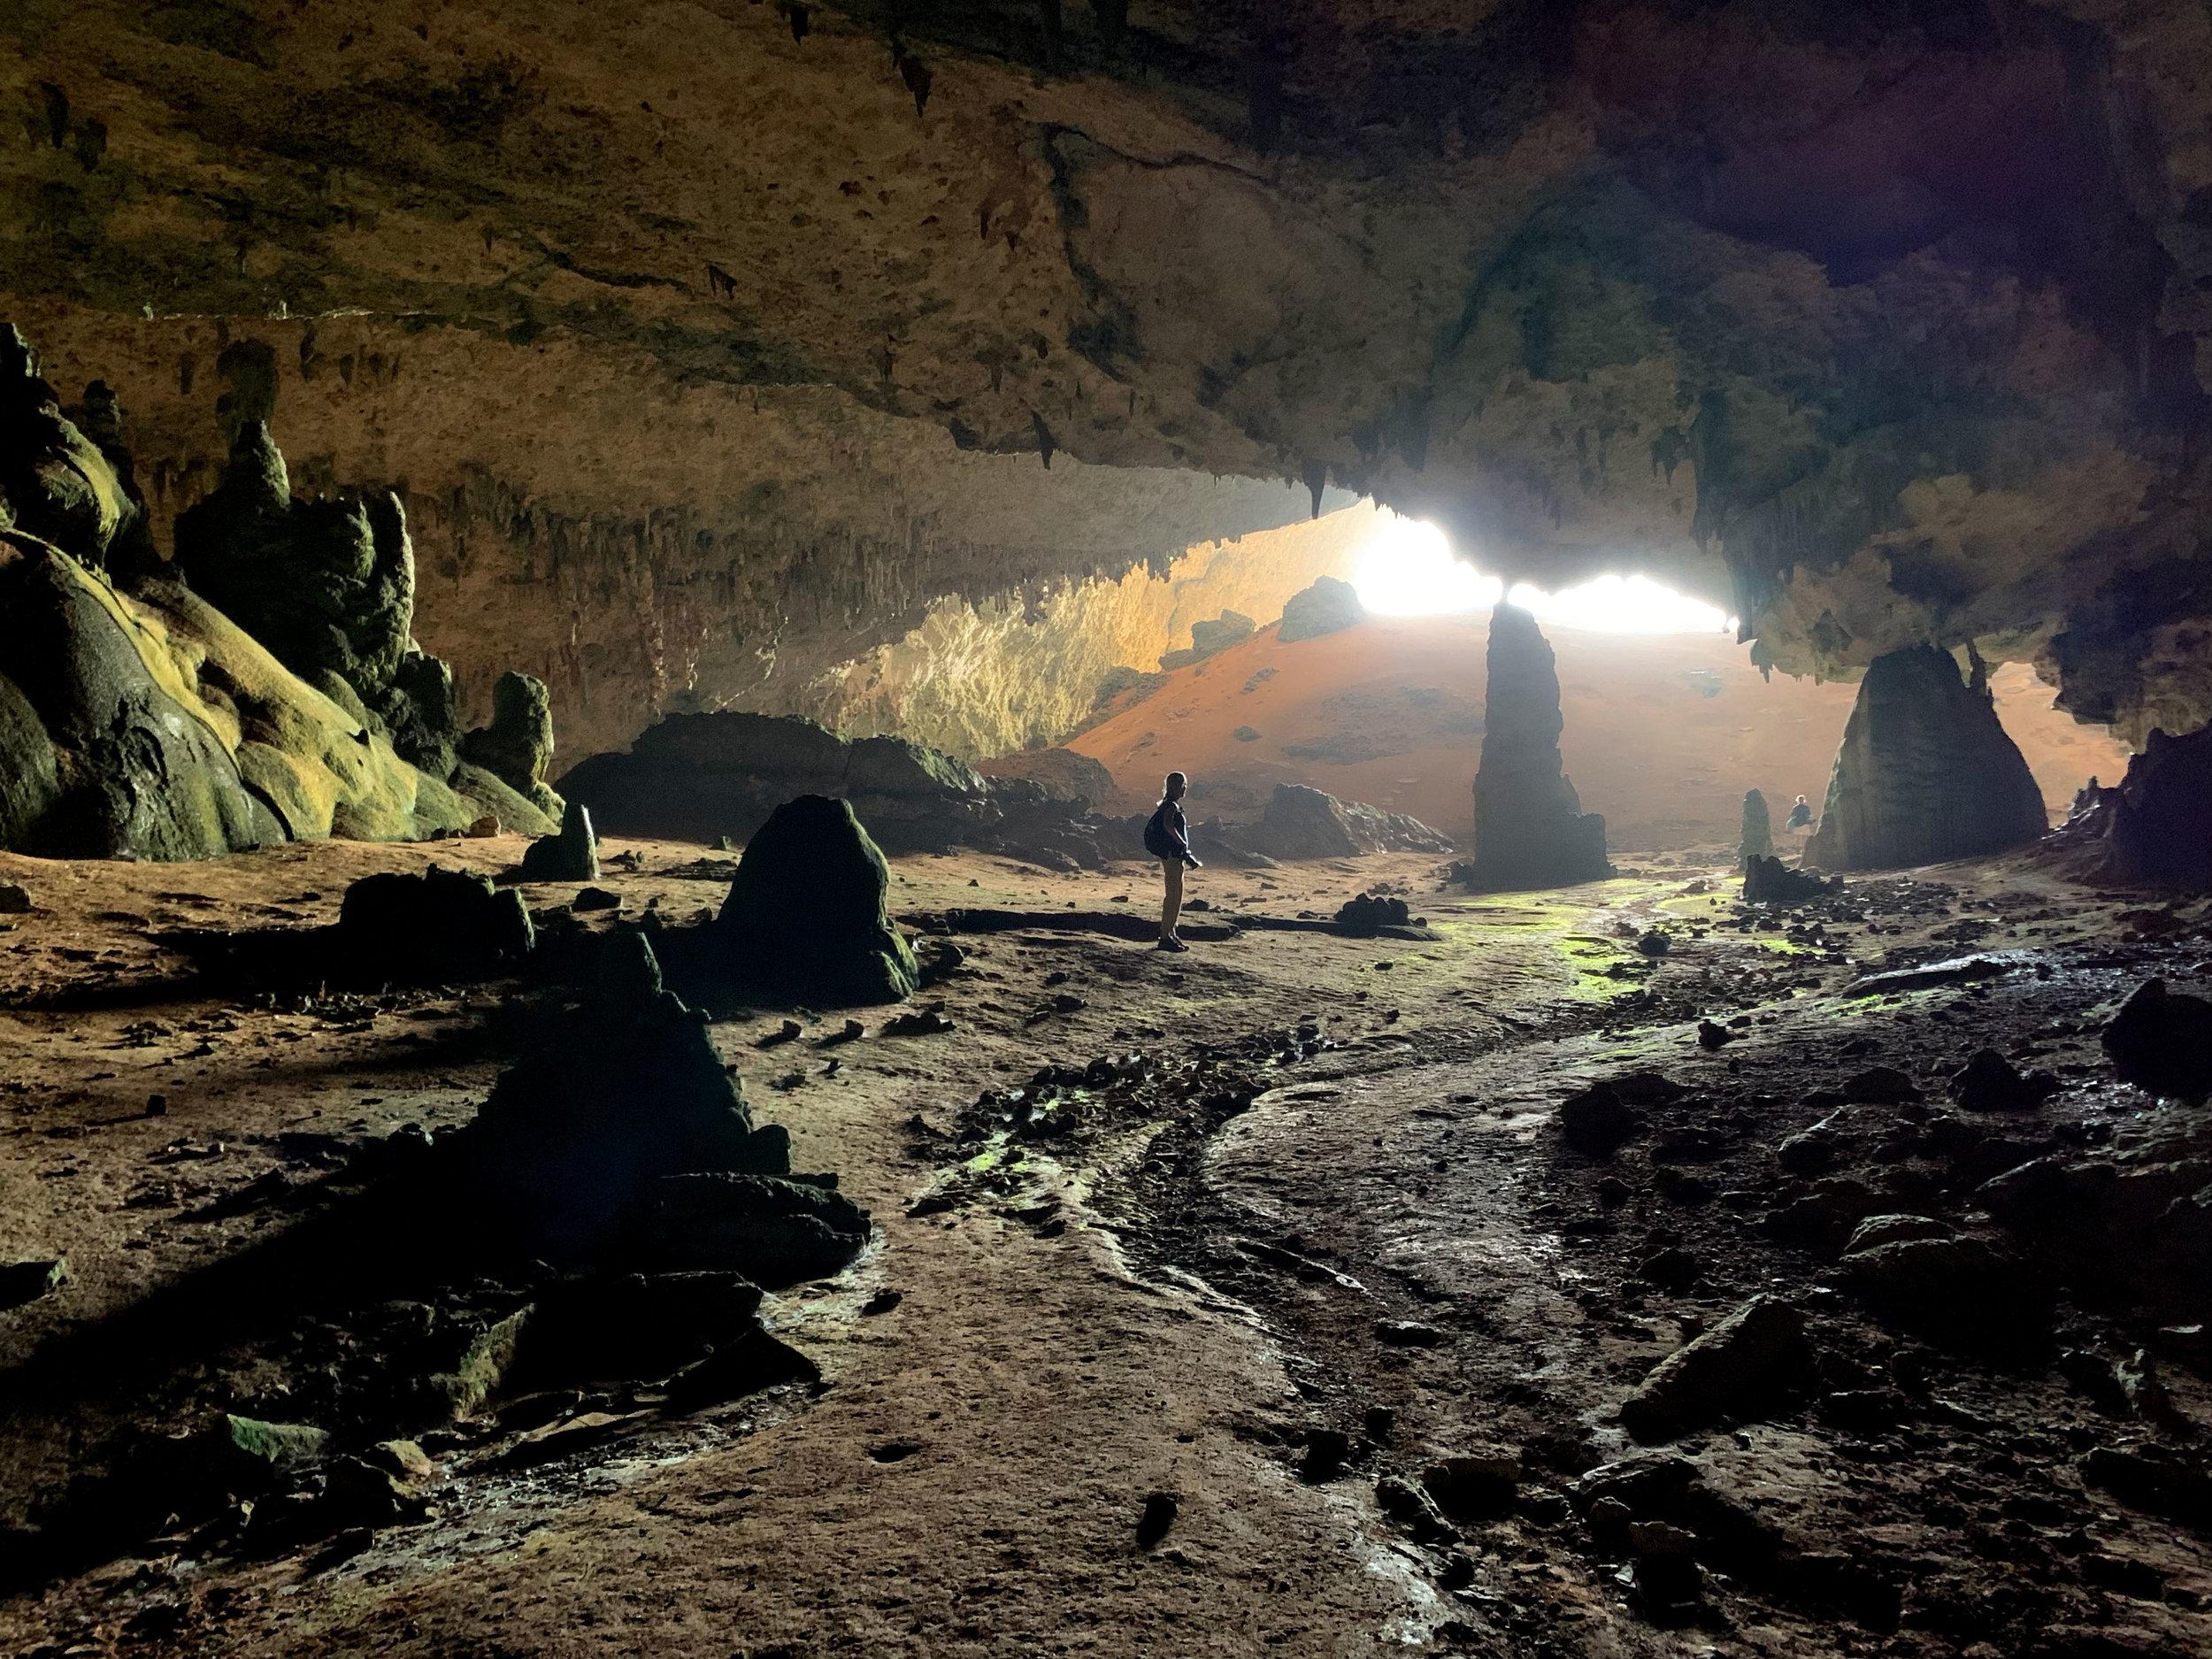 hoq-cave-entrance-socotra-island-yemen-inertia-network.jpg